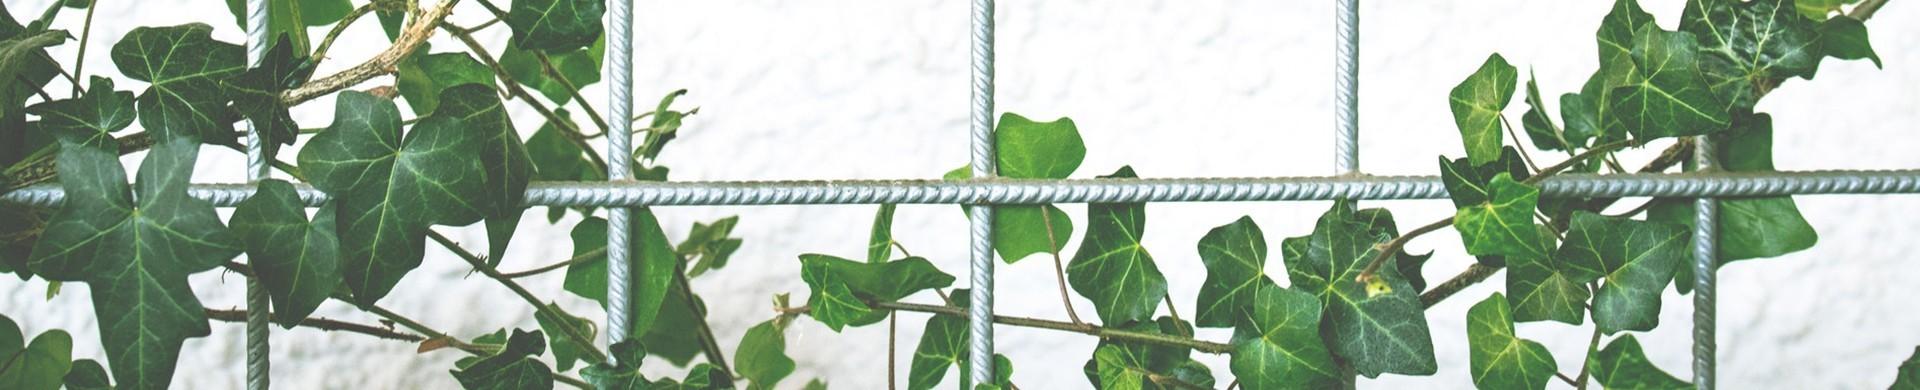 Accesorios jardin - Comprar accesorios de jardin